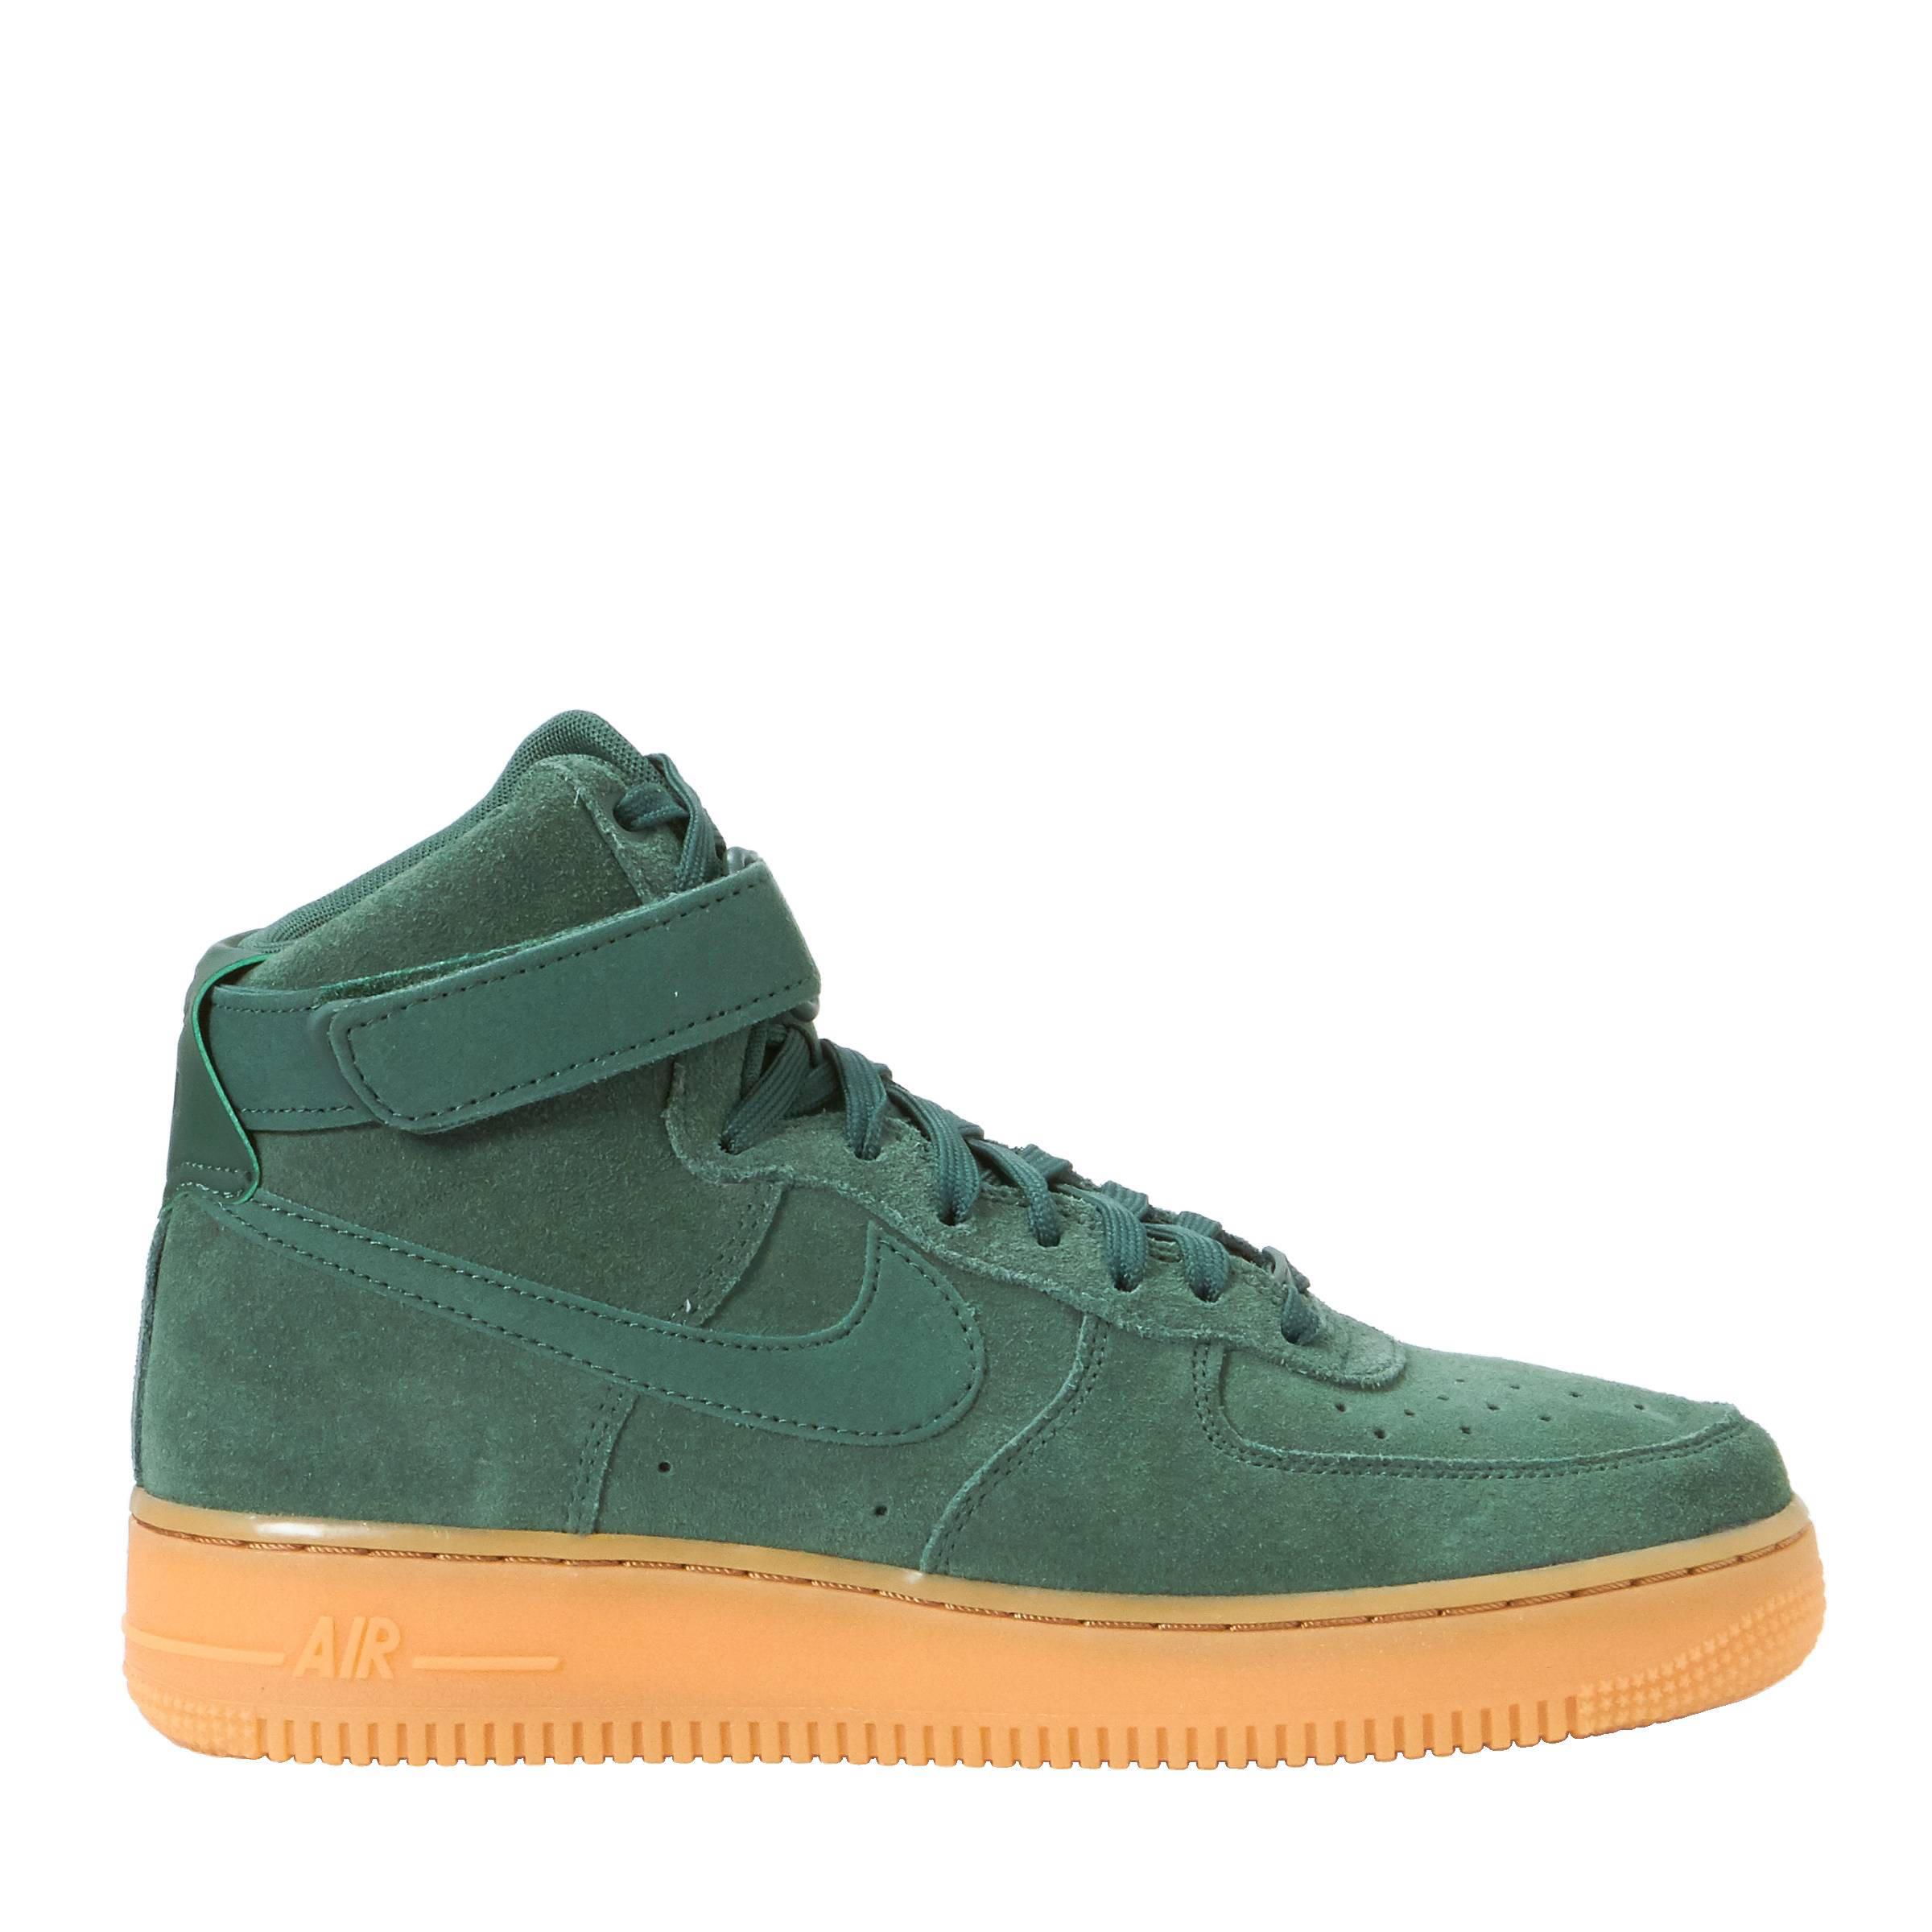 nike air force 1 high heren sale